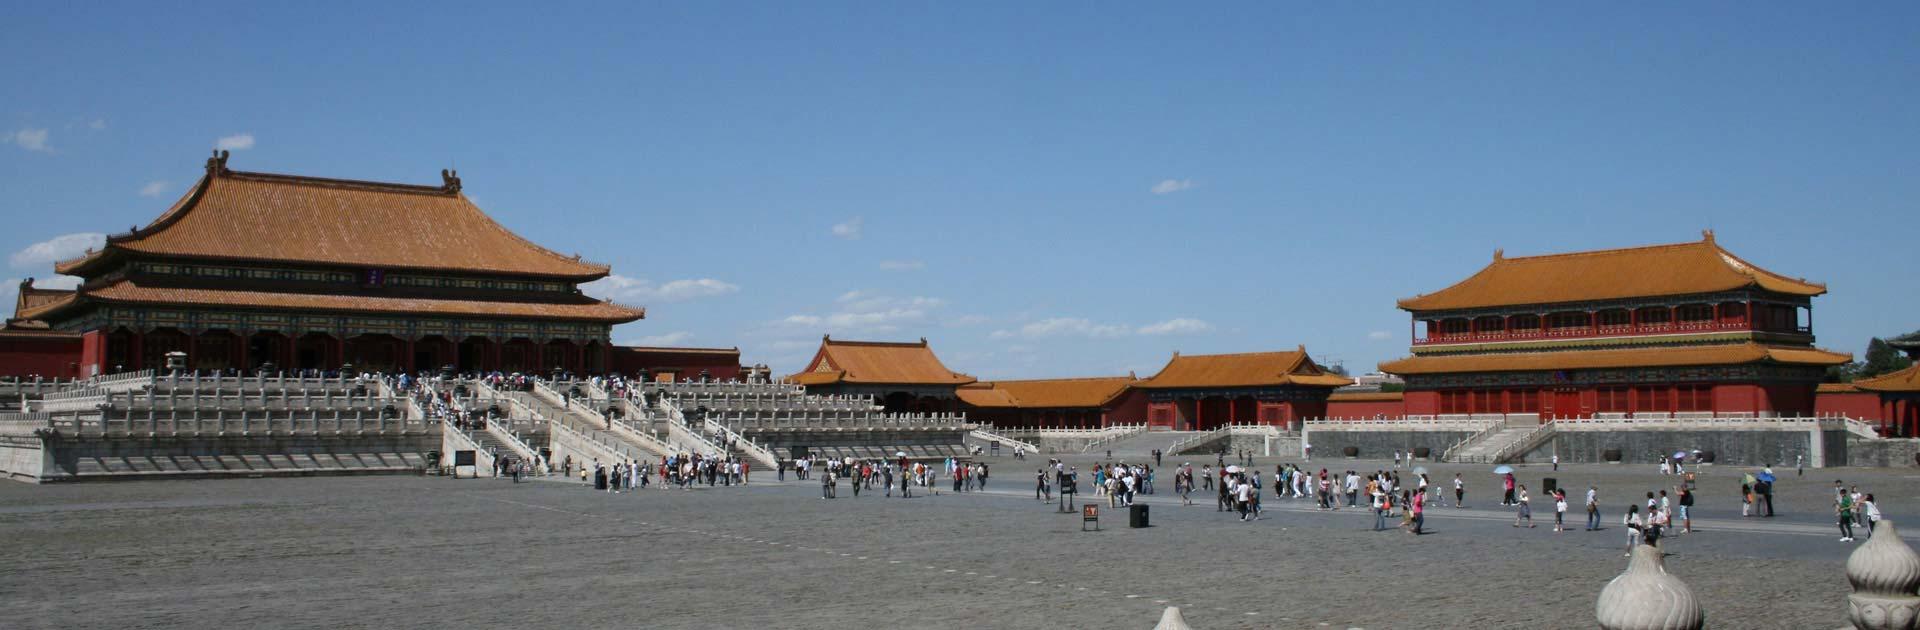 CN Disfruta Peking 8 días 3